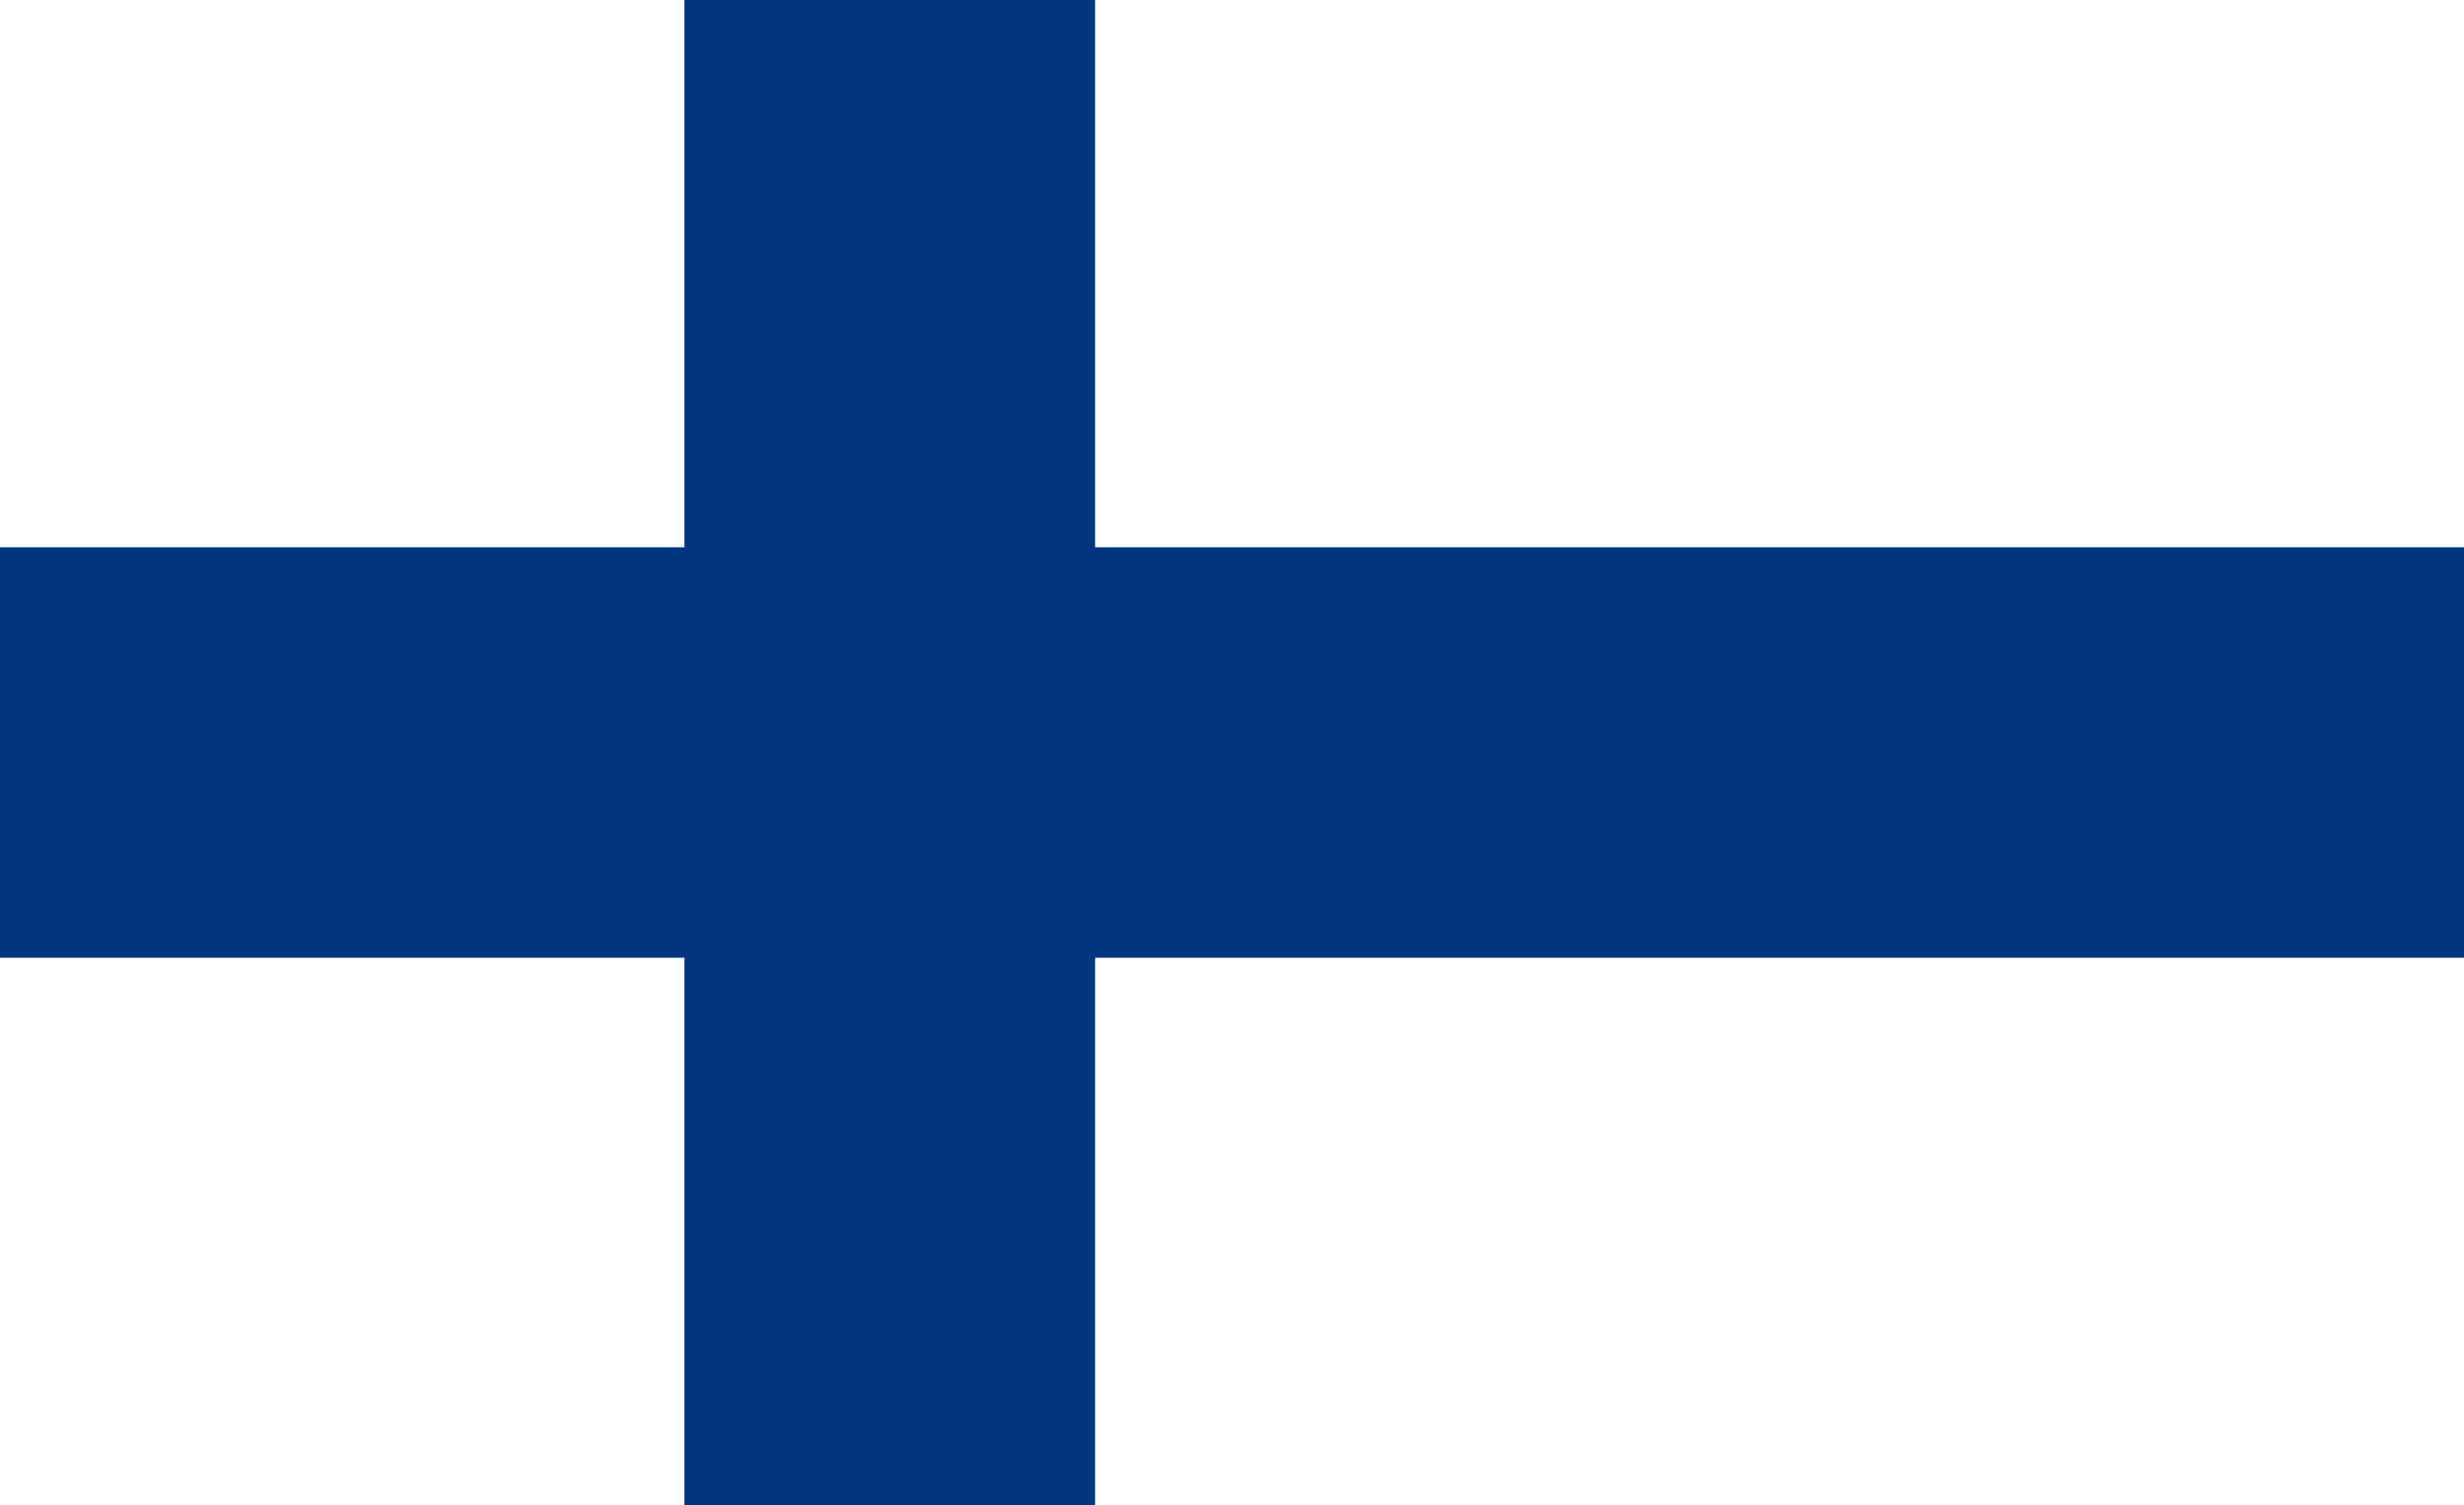 Finlandia, paese, emblema, logo, simbolo - Sfondi HD - Professor-falken.com